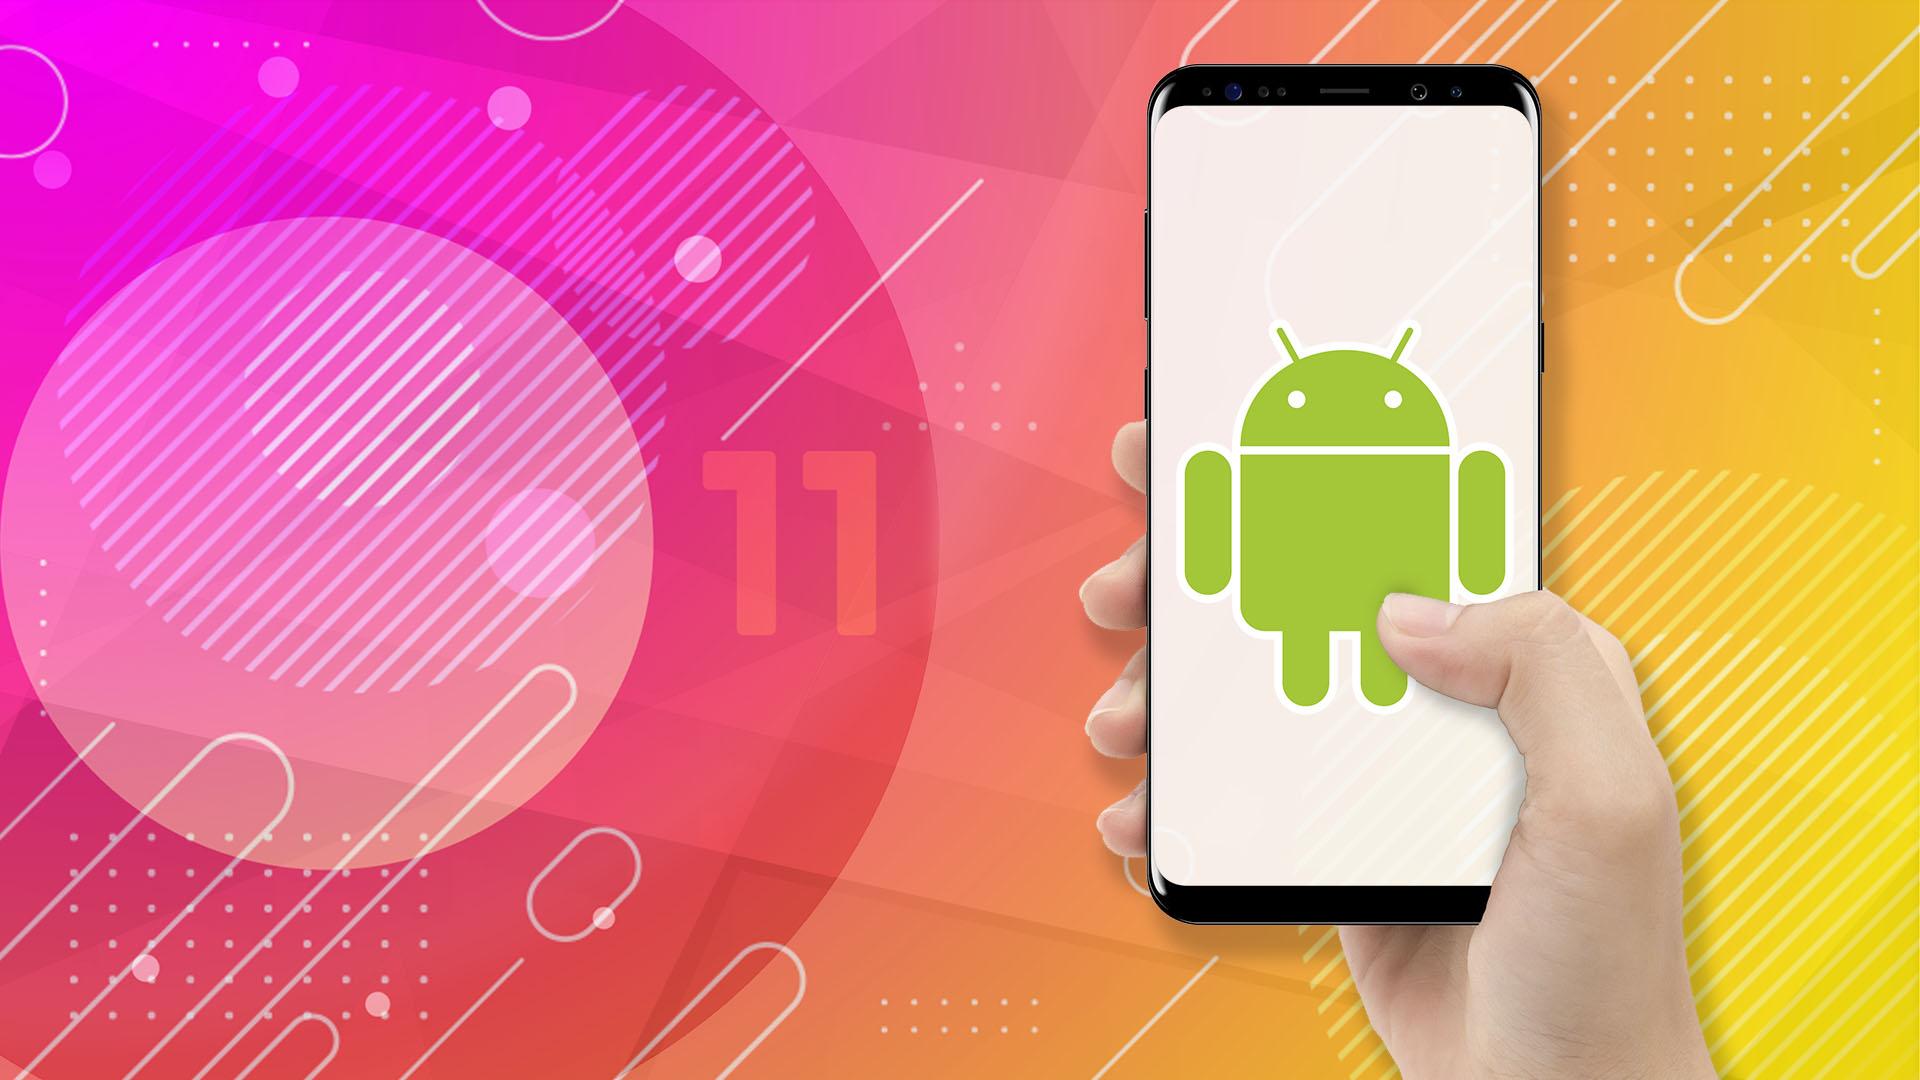 Smartphone, Betriebssystem, Google, Android, Google Android, Android 11, Android Logo, Bugdroid, Android Figur, Google Android 11, Android Männchen, Android 11 Beta